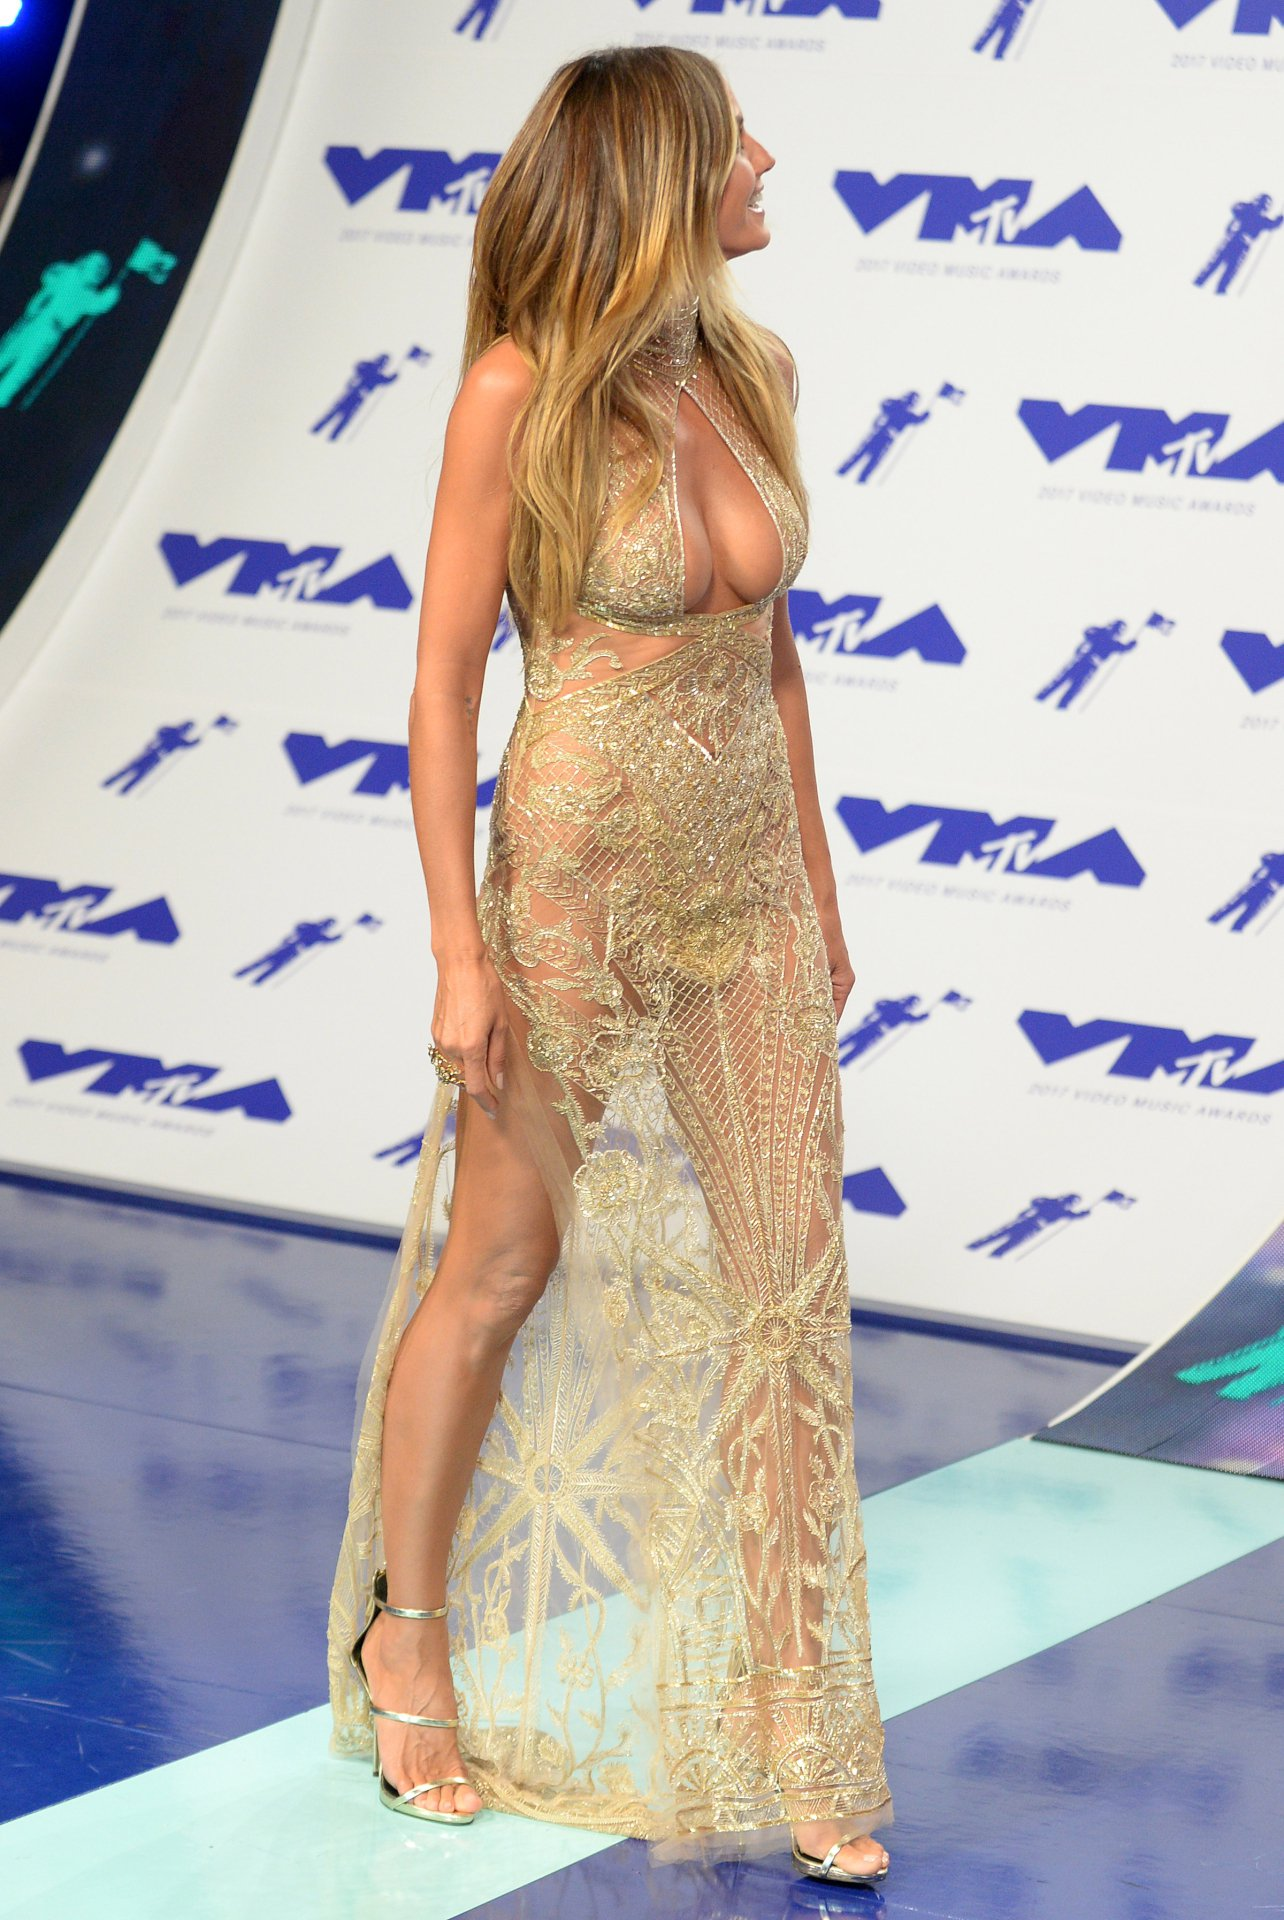 Heidi Klum Cleavage Boobs | Hot Celebs Home